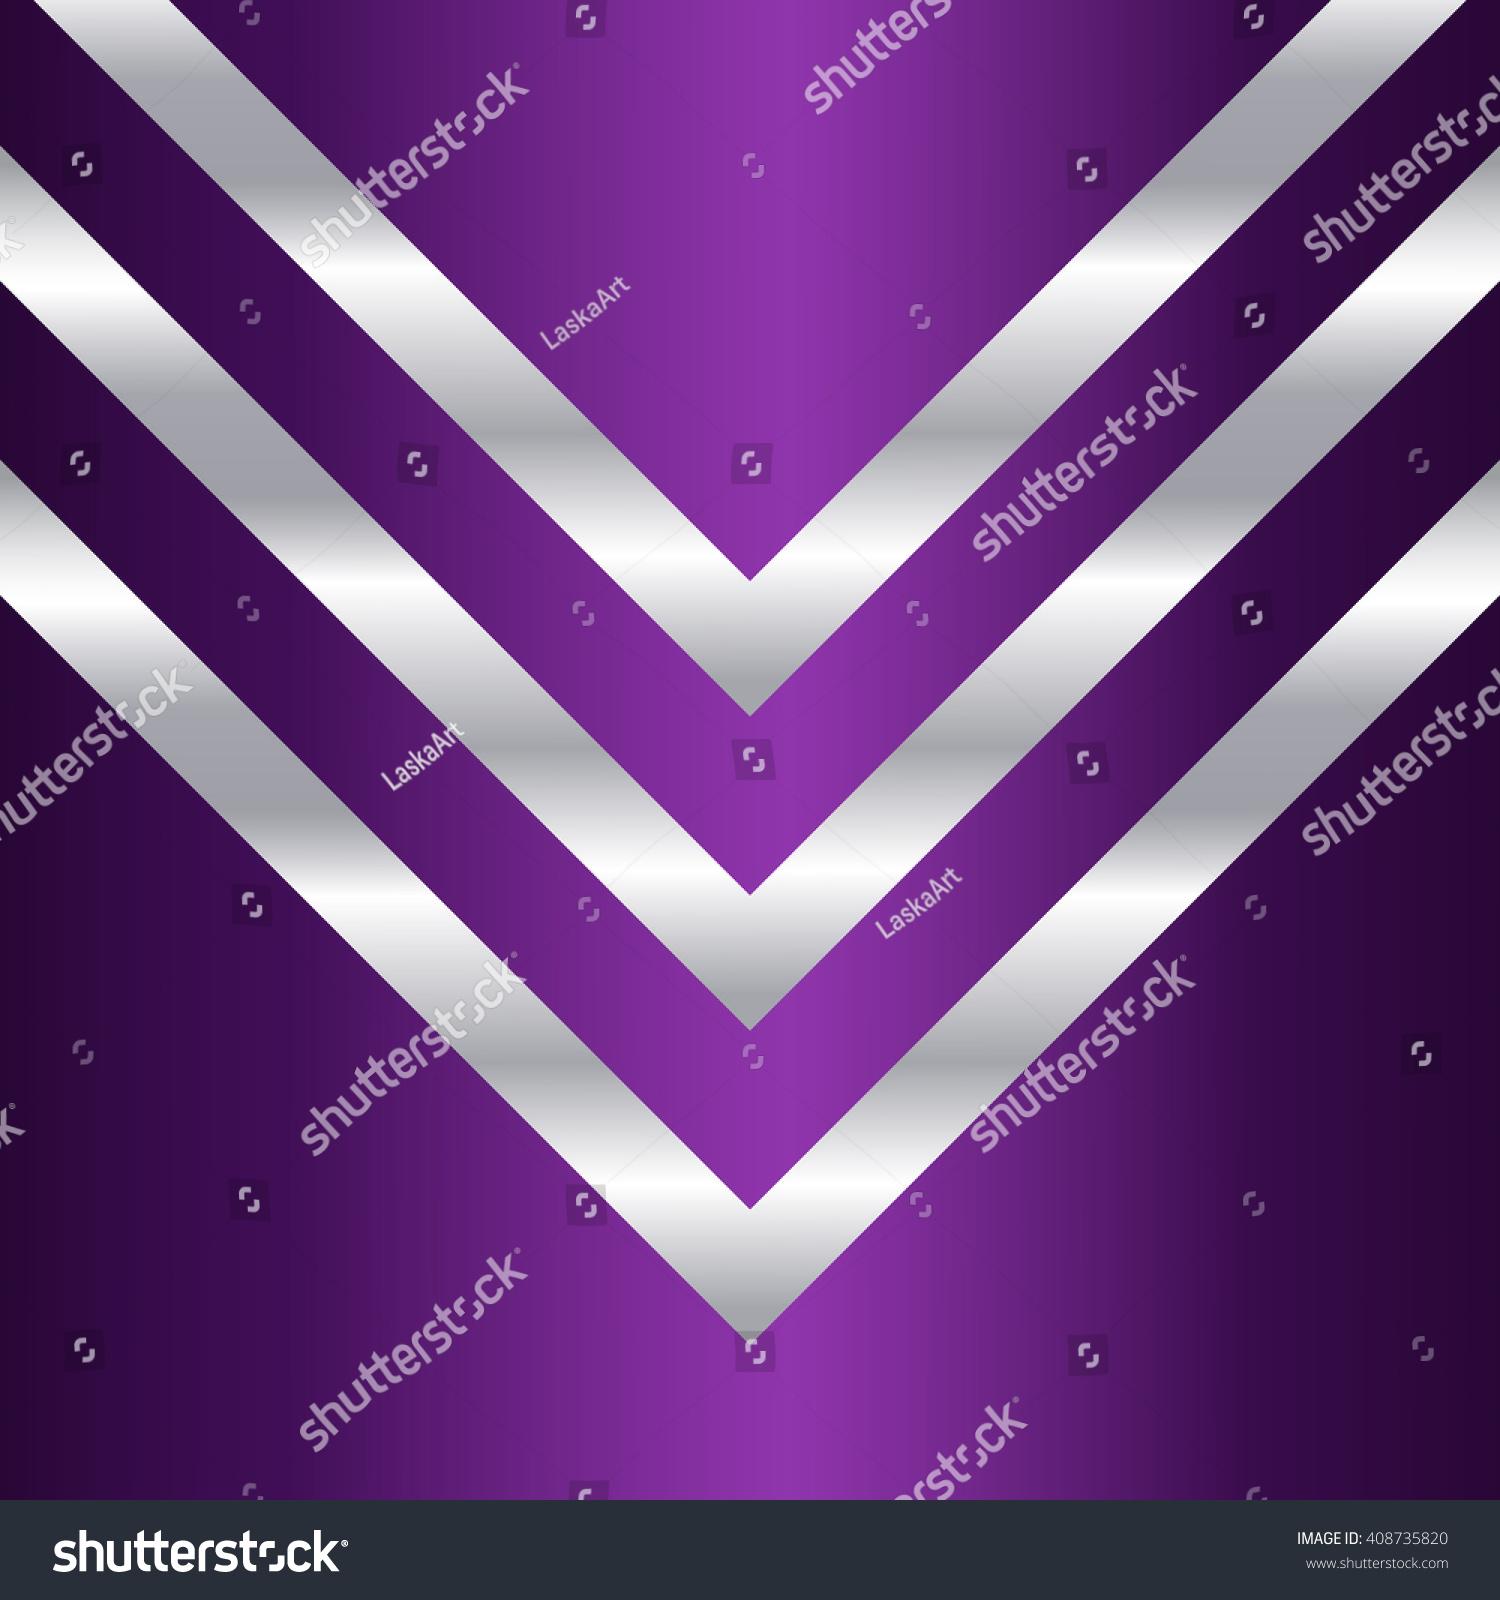 Template Striped Elements Design Voucher Gift Stock Illustration ...